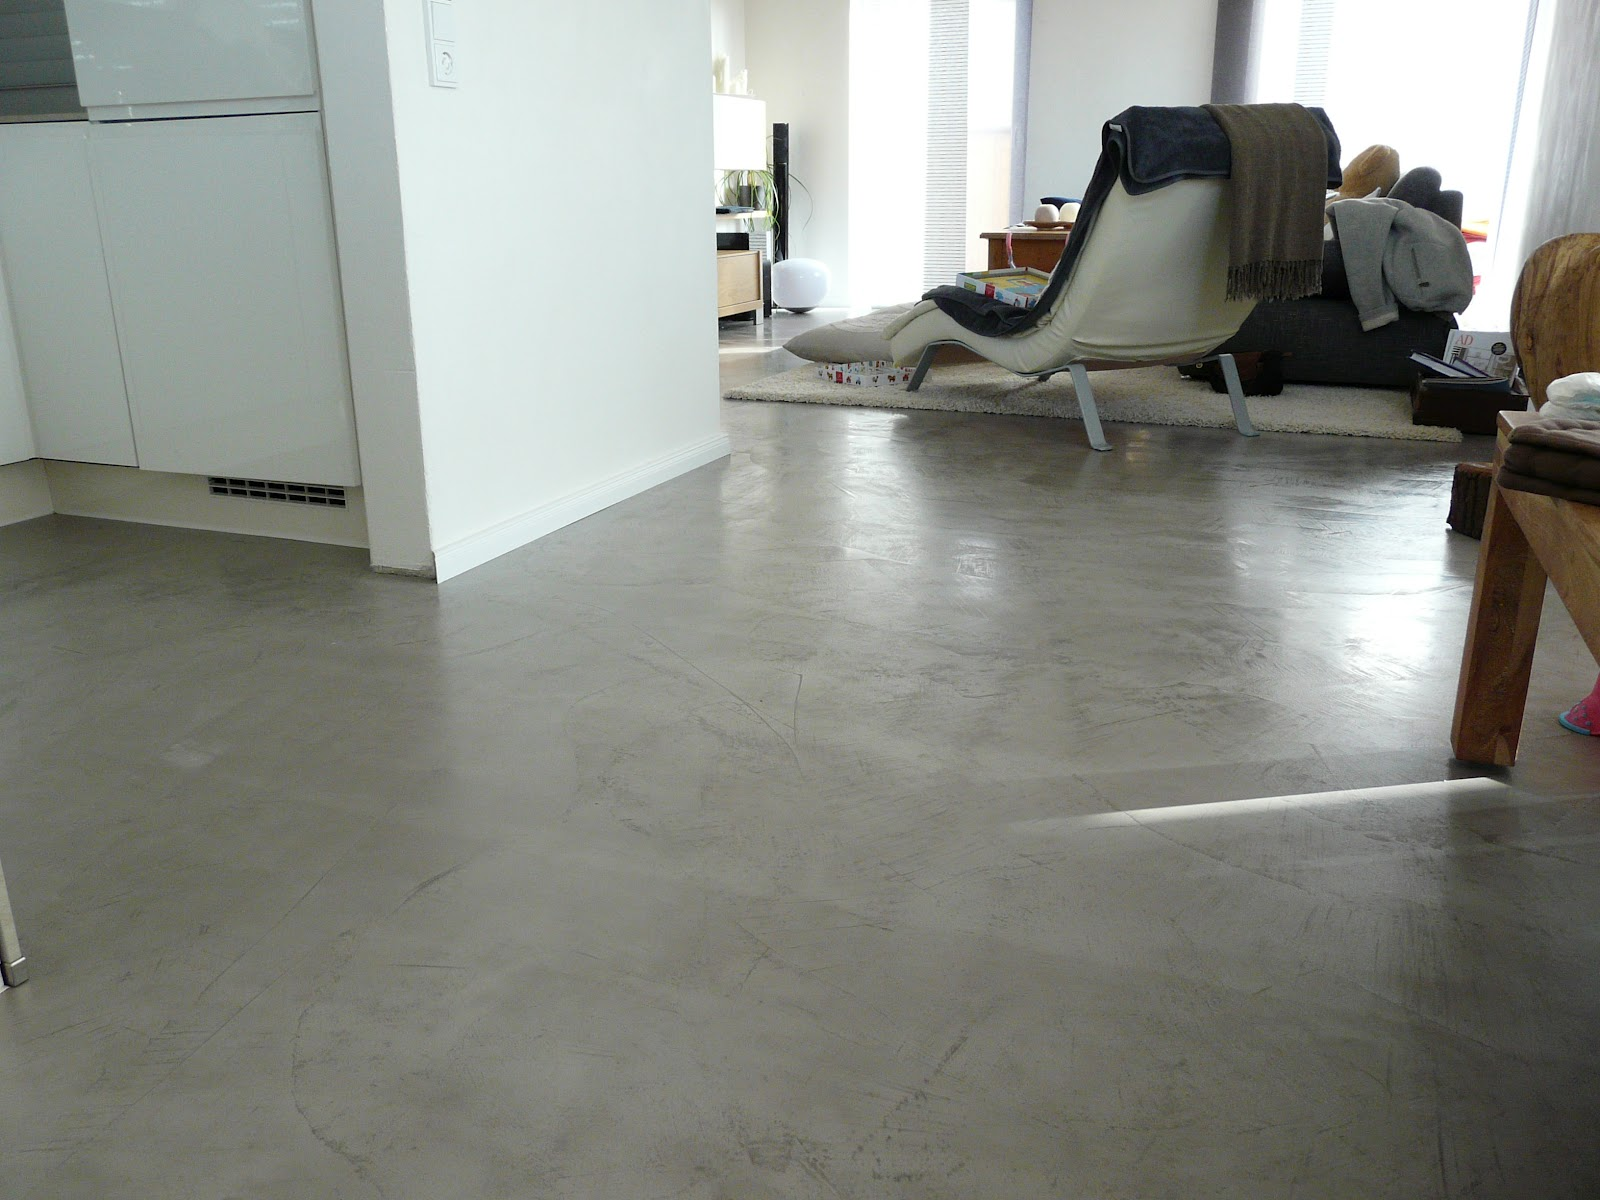 wand wohndesign beton cire beton floor bodenbeschichtung in betonoptik. Black Bedroom Furniture Sets. Home Design Ideas